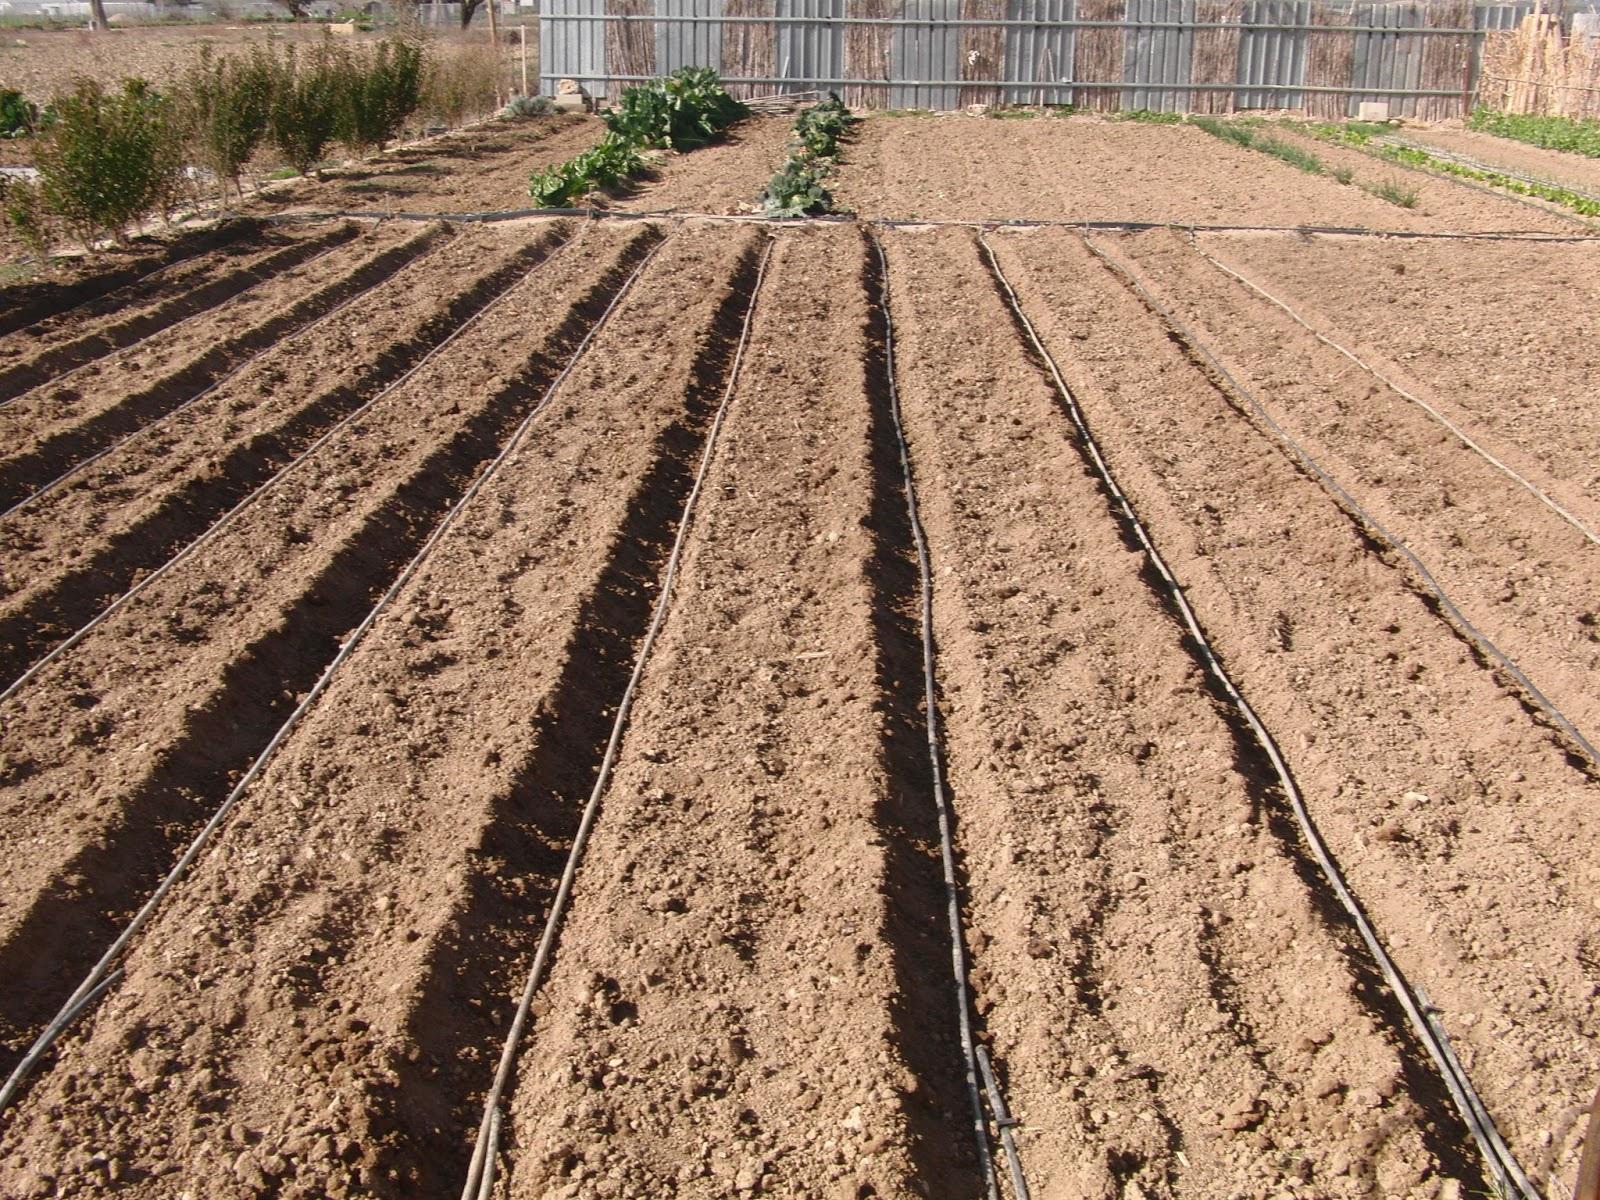 Un huerto familiar sembrar patatas dia 22 febrero for Como cultivar patatas